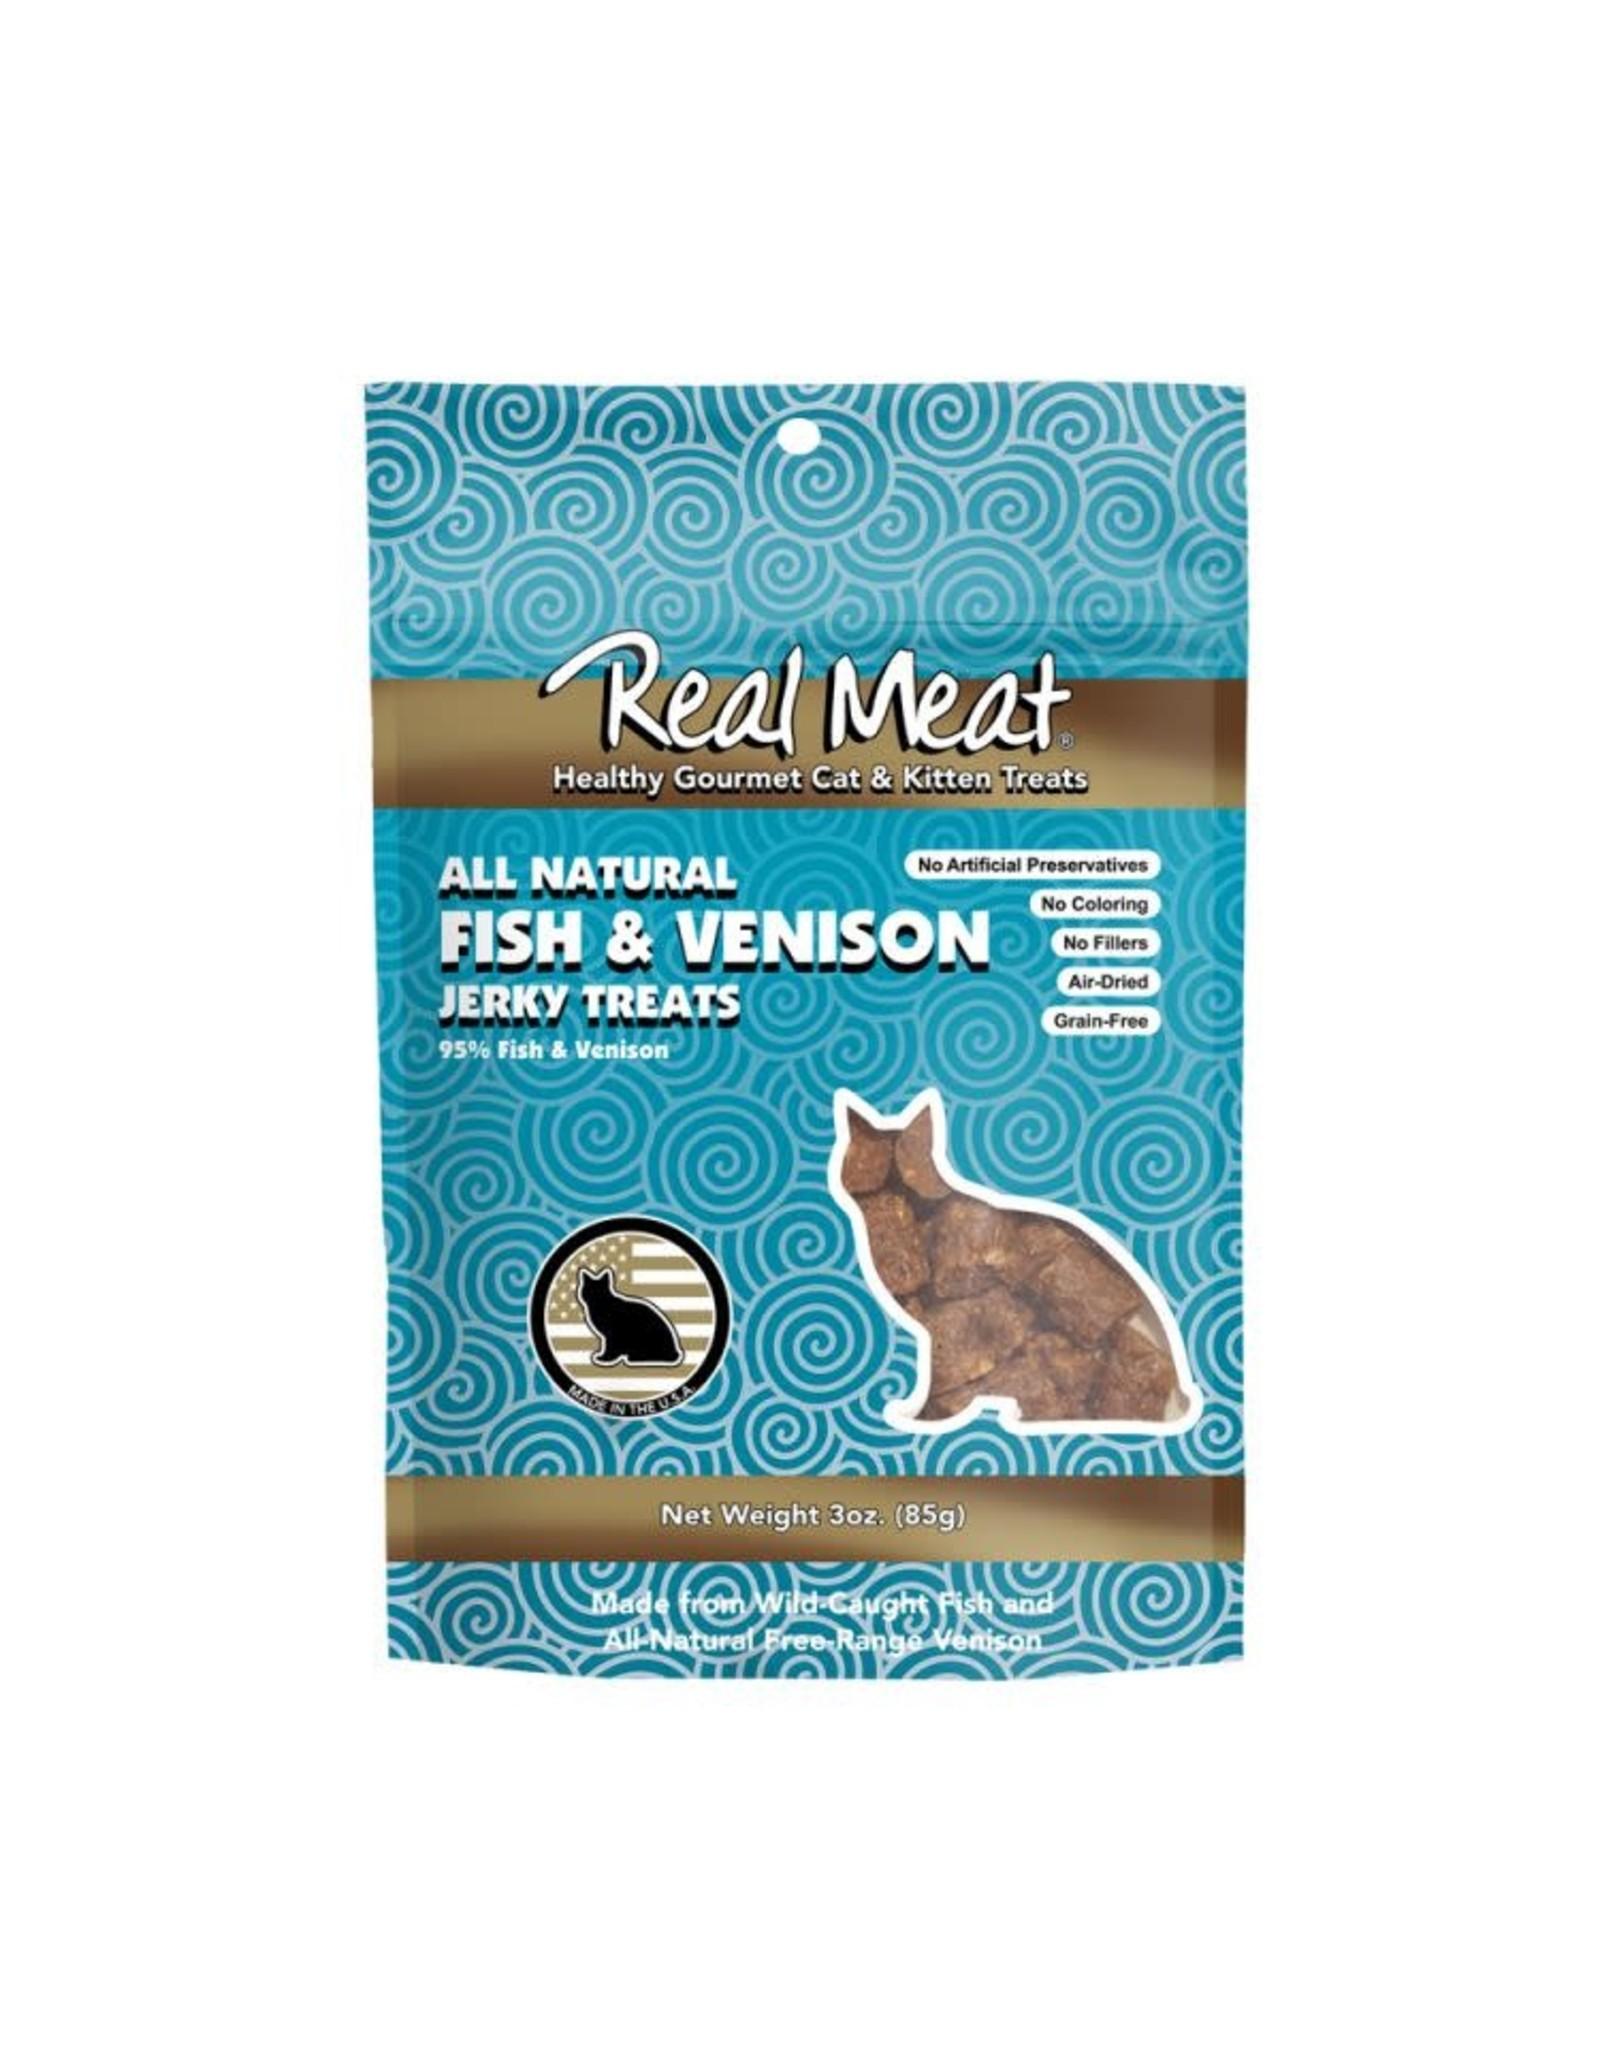 The Real Meat Company Real Meat Fish & Venison Jerky Cat Treats 3oz.